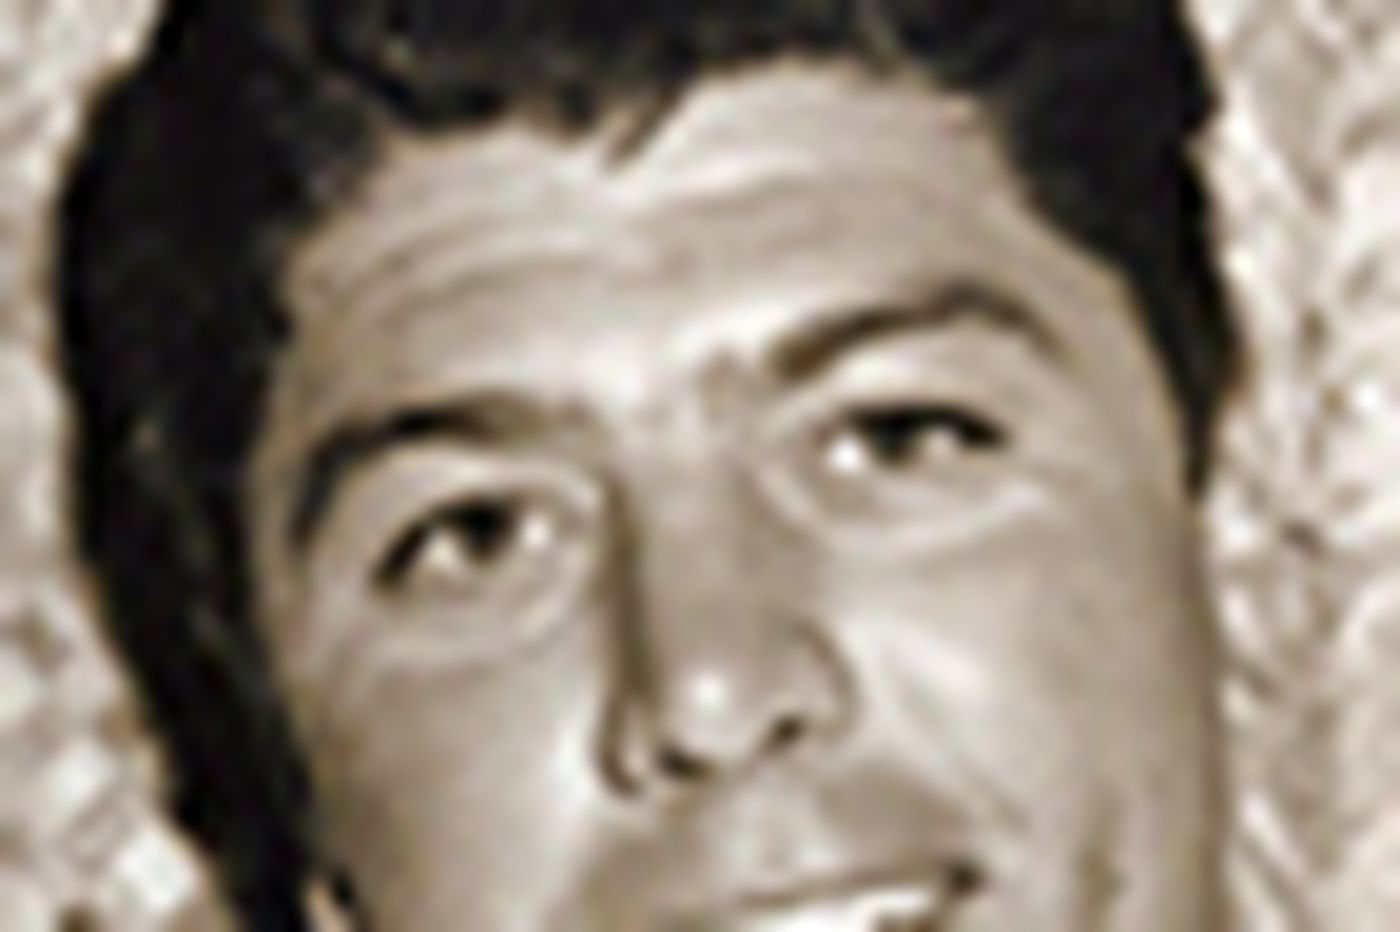 Charles Augustus Ernst Jr., 98, executive, WWII vet